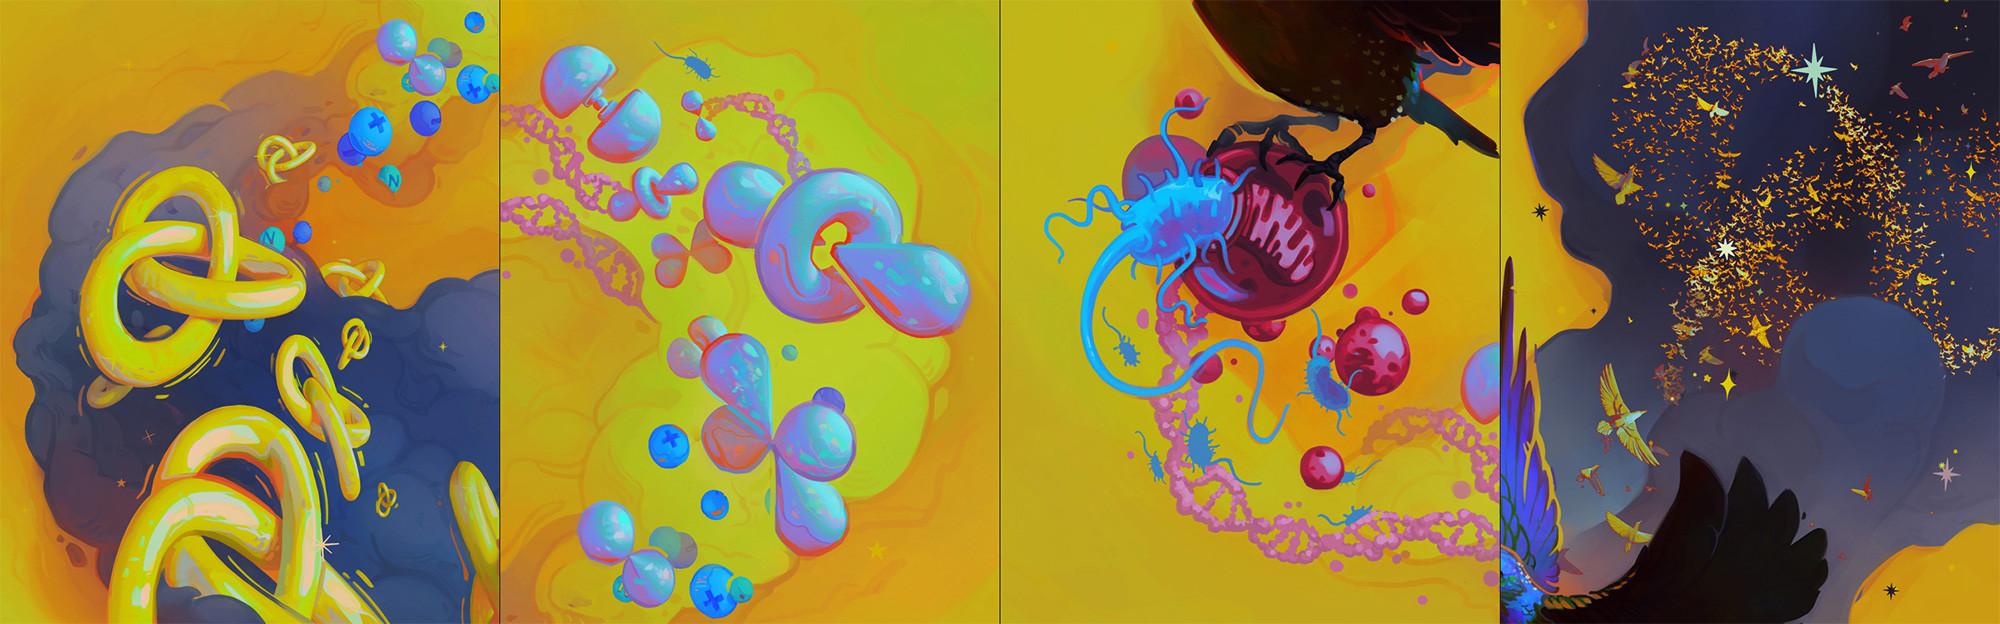 Details: quarks › particles › orbitals › DNA › prokaryotes › eukaryotic cells › starling (Sturnus vulgaris) › murmuration  Info & software breakdown: https://tinyurl.com/SphBrk1  Concepting & process: https://tinyurl.com/SphBrk2  ↓